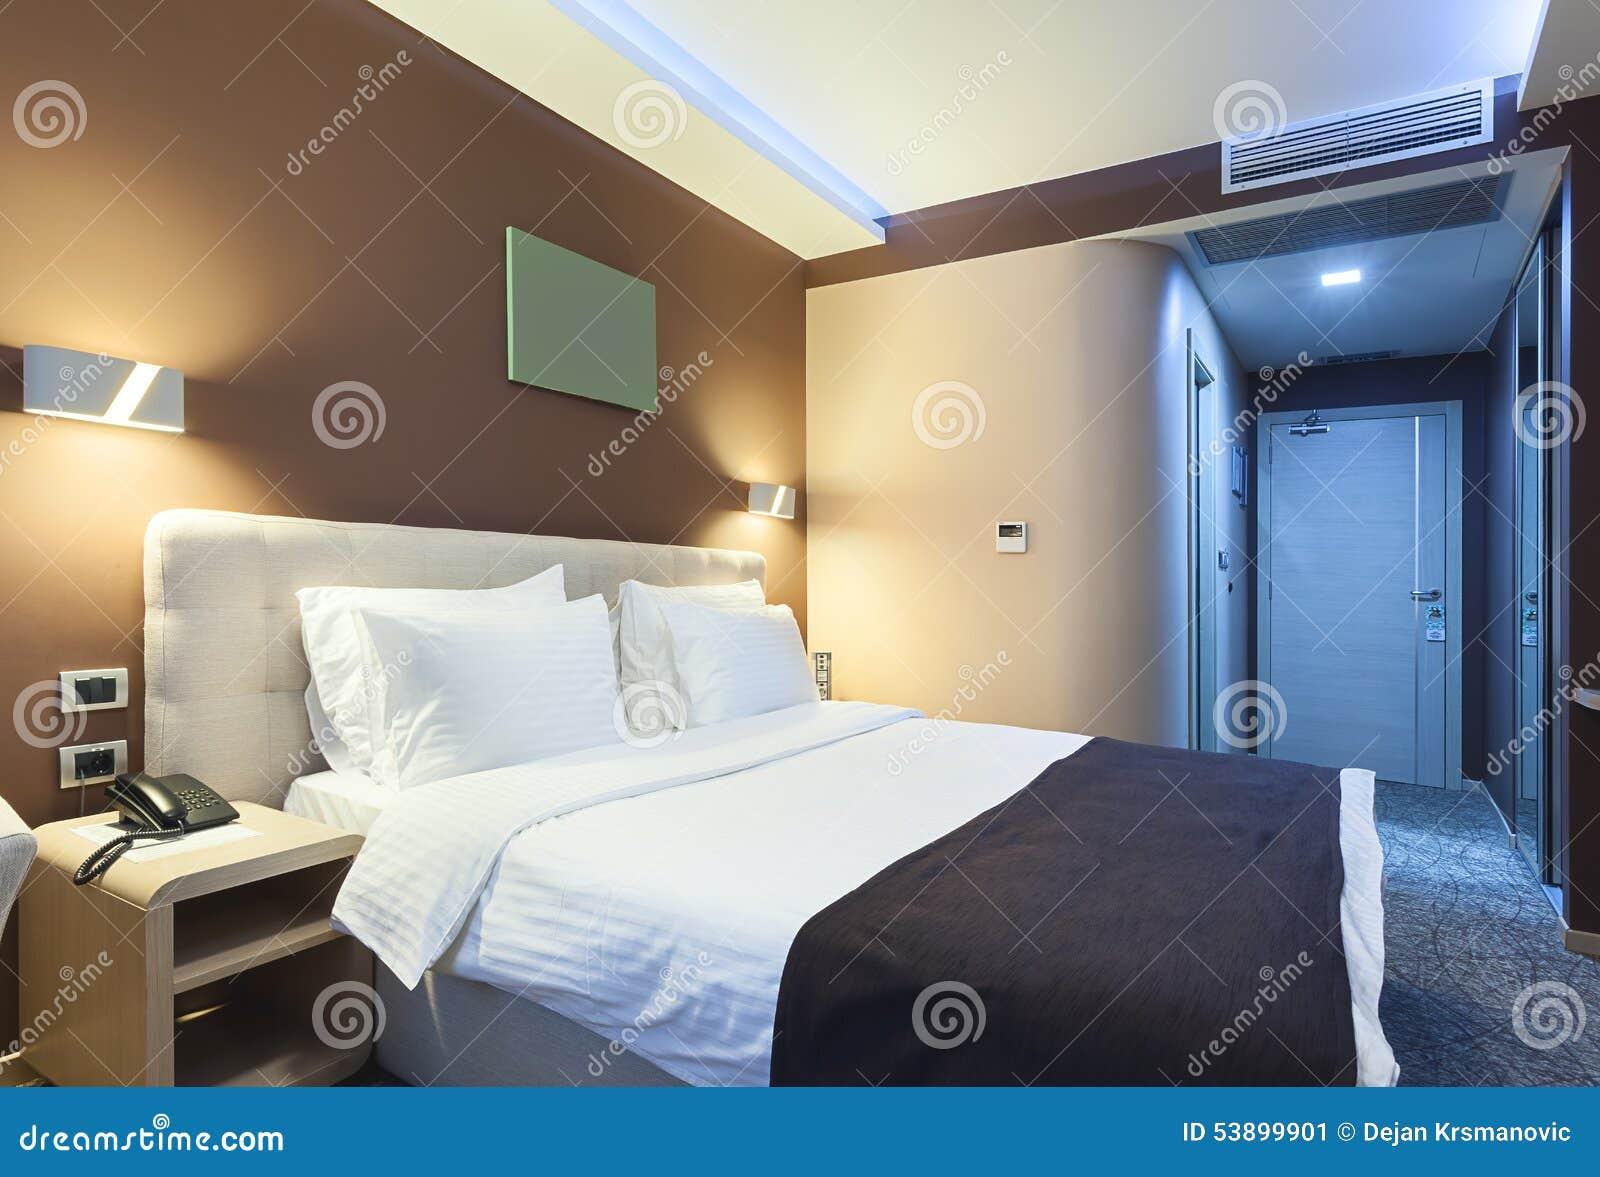 Chambre d hotel de luxe moderne pr l vement for Chambre hotel luxe pas cher